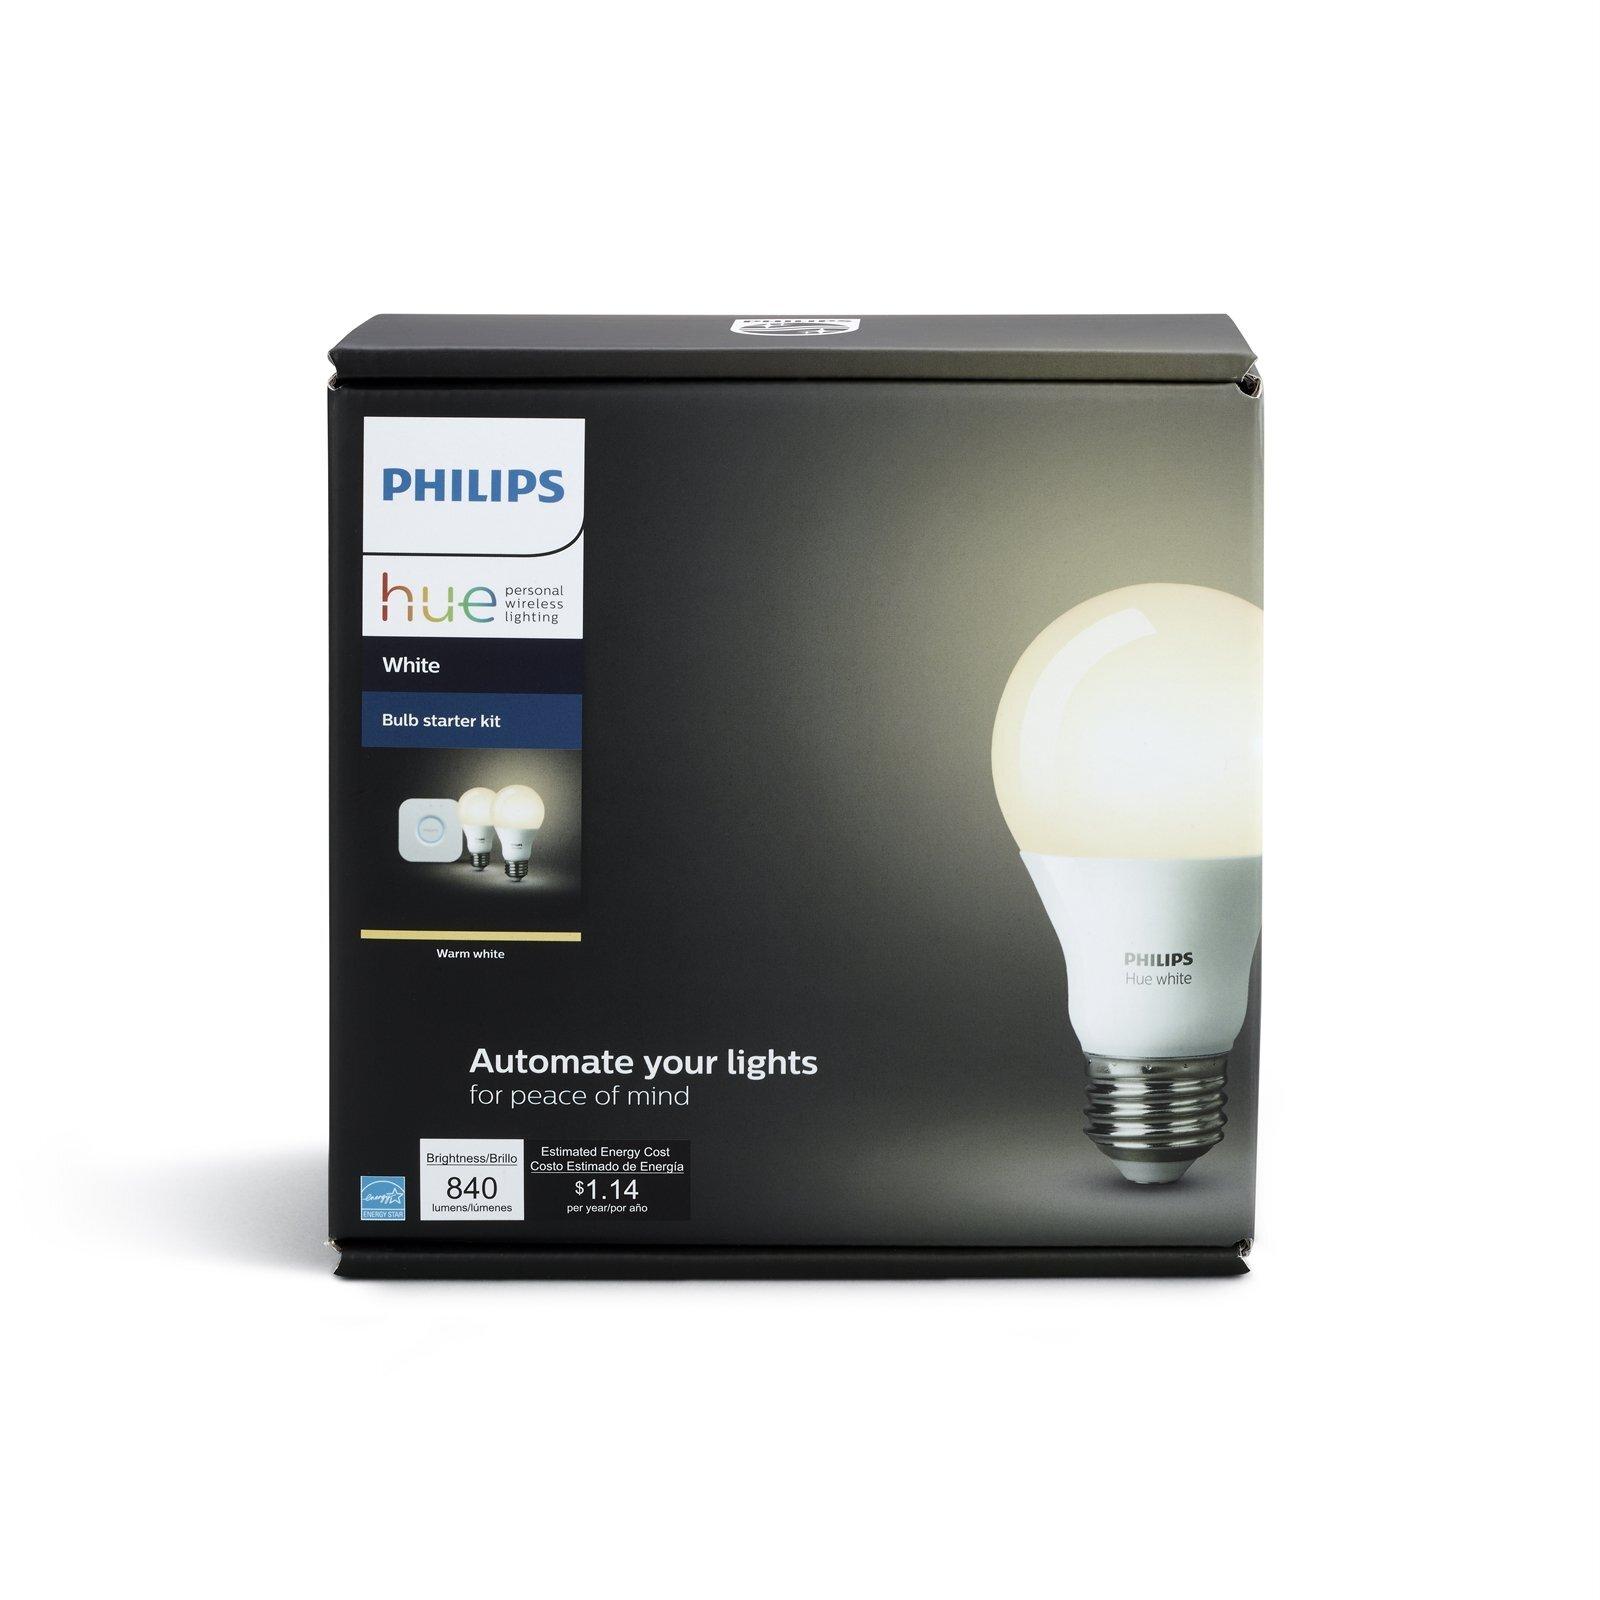 Philips Hue 2 White E27 Bulbs And Bridge Starter Kit